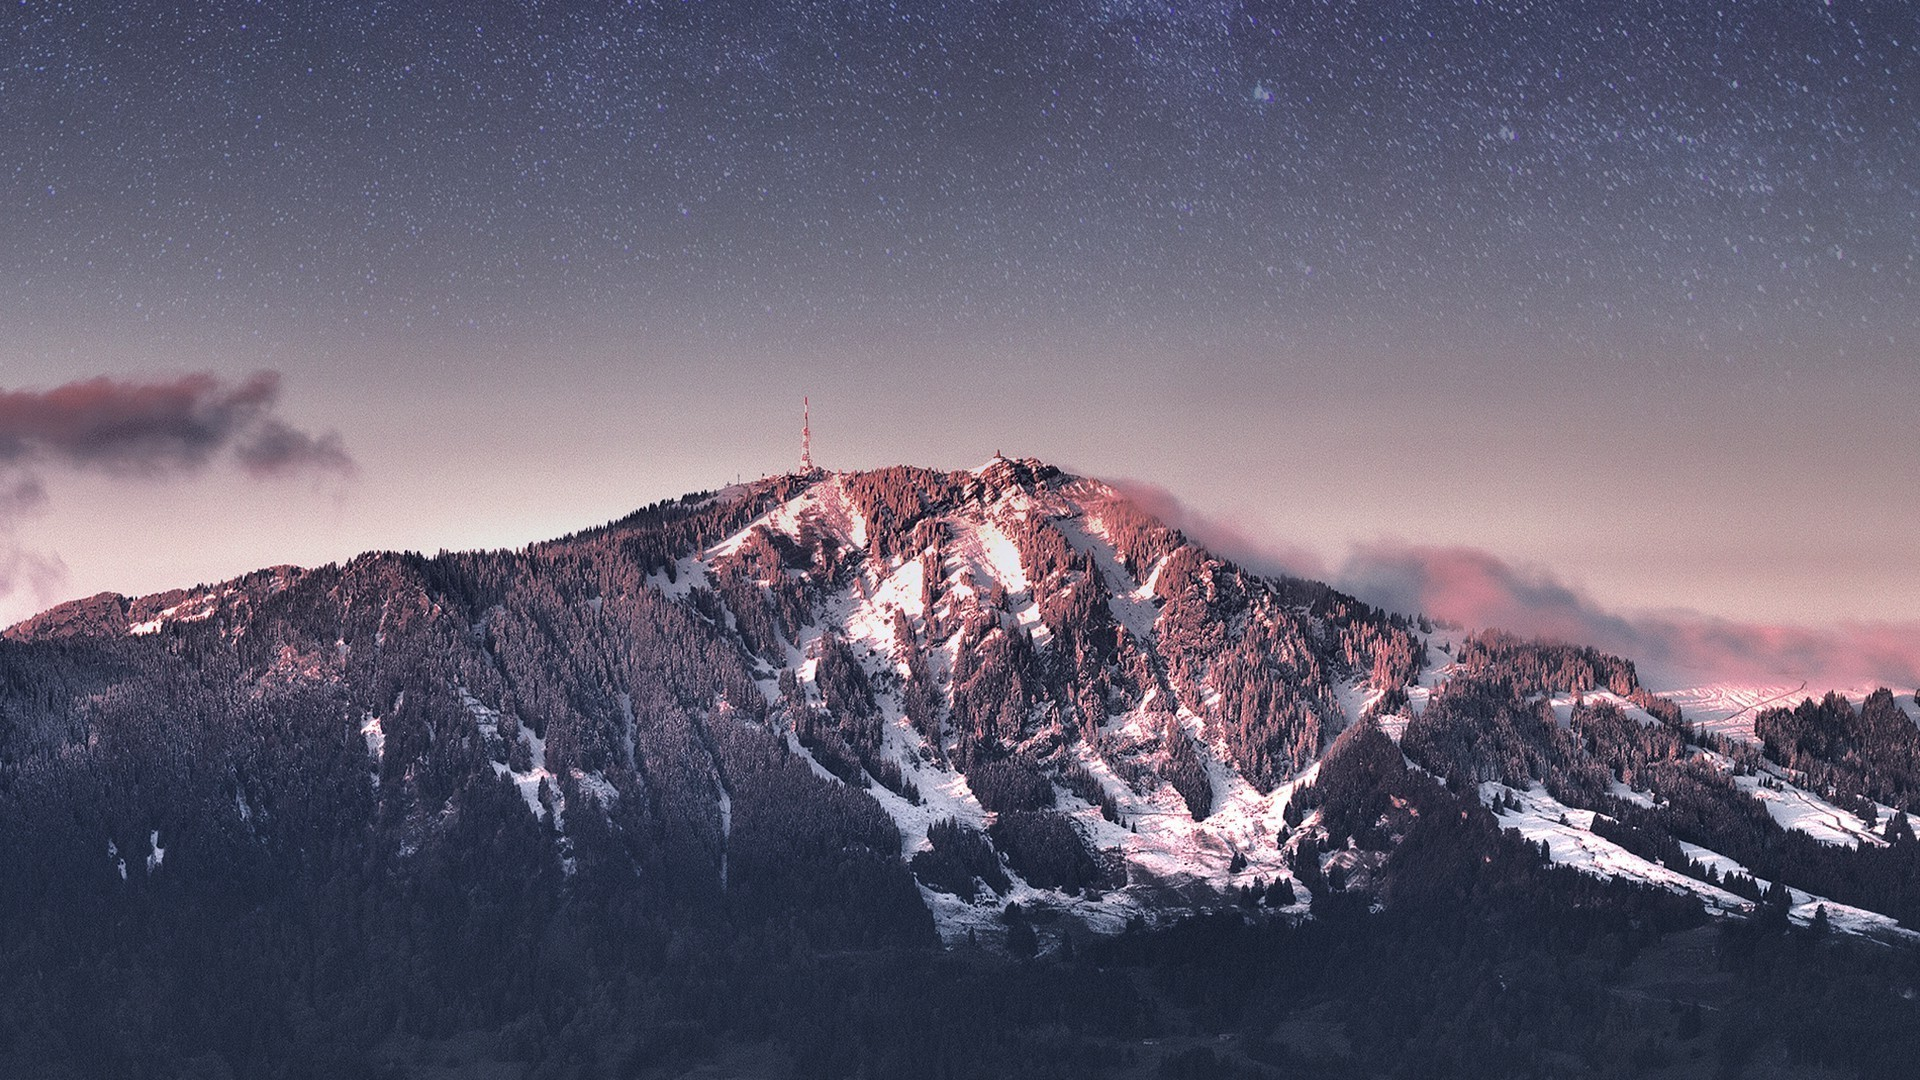 Night Mountain Wallpapers 1080p …